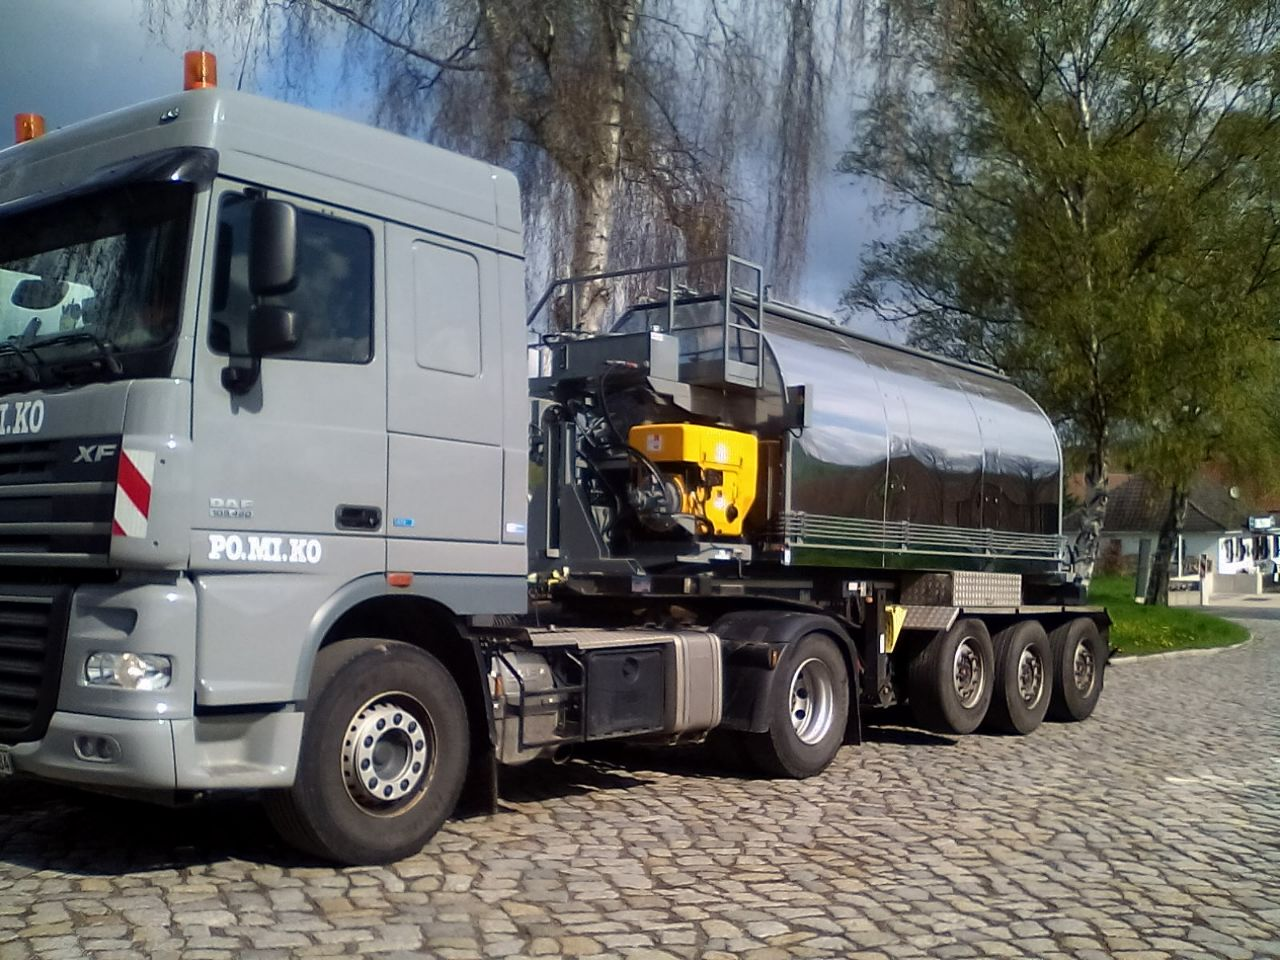 Gussasphalttransport: 2 neue Gussasphaltkocher mit 10cbm Fassungsvermögen